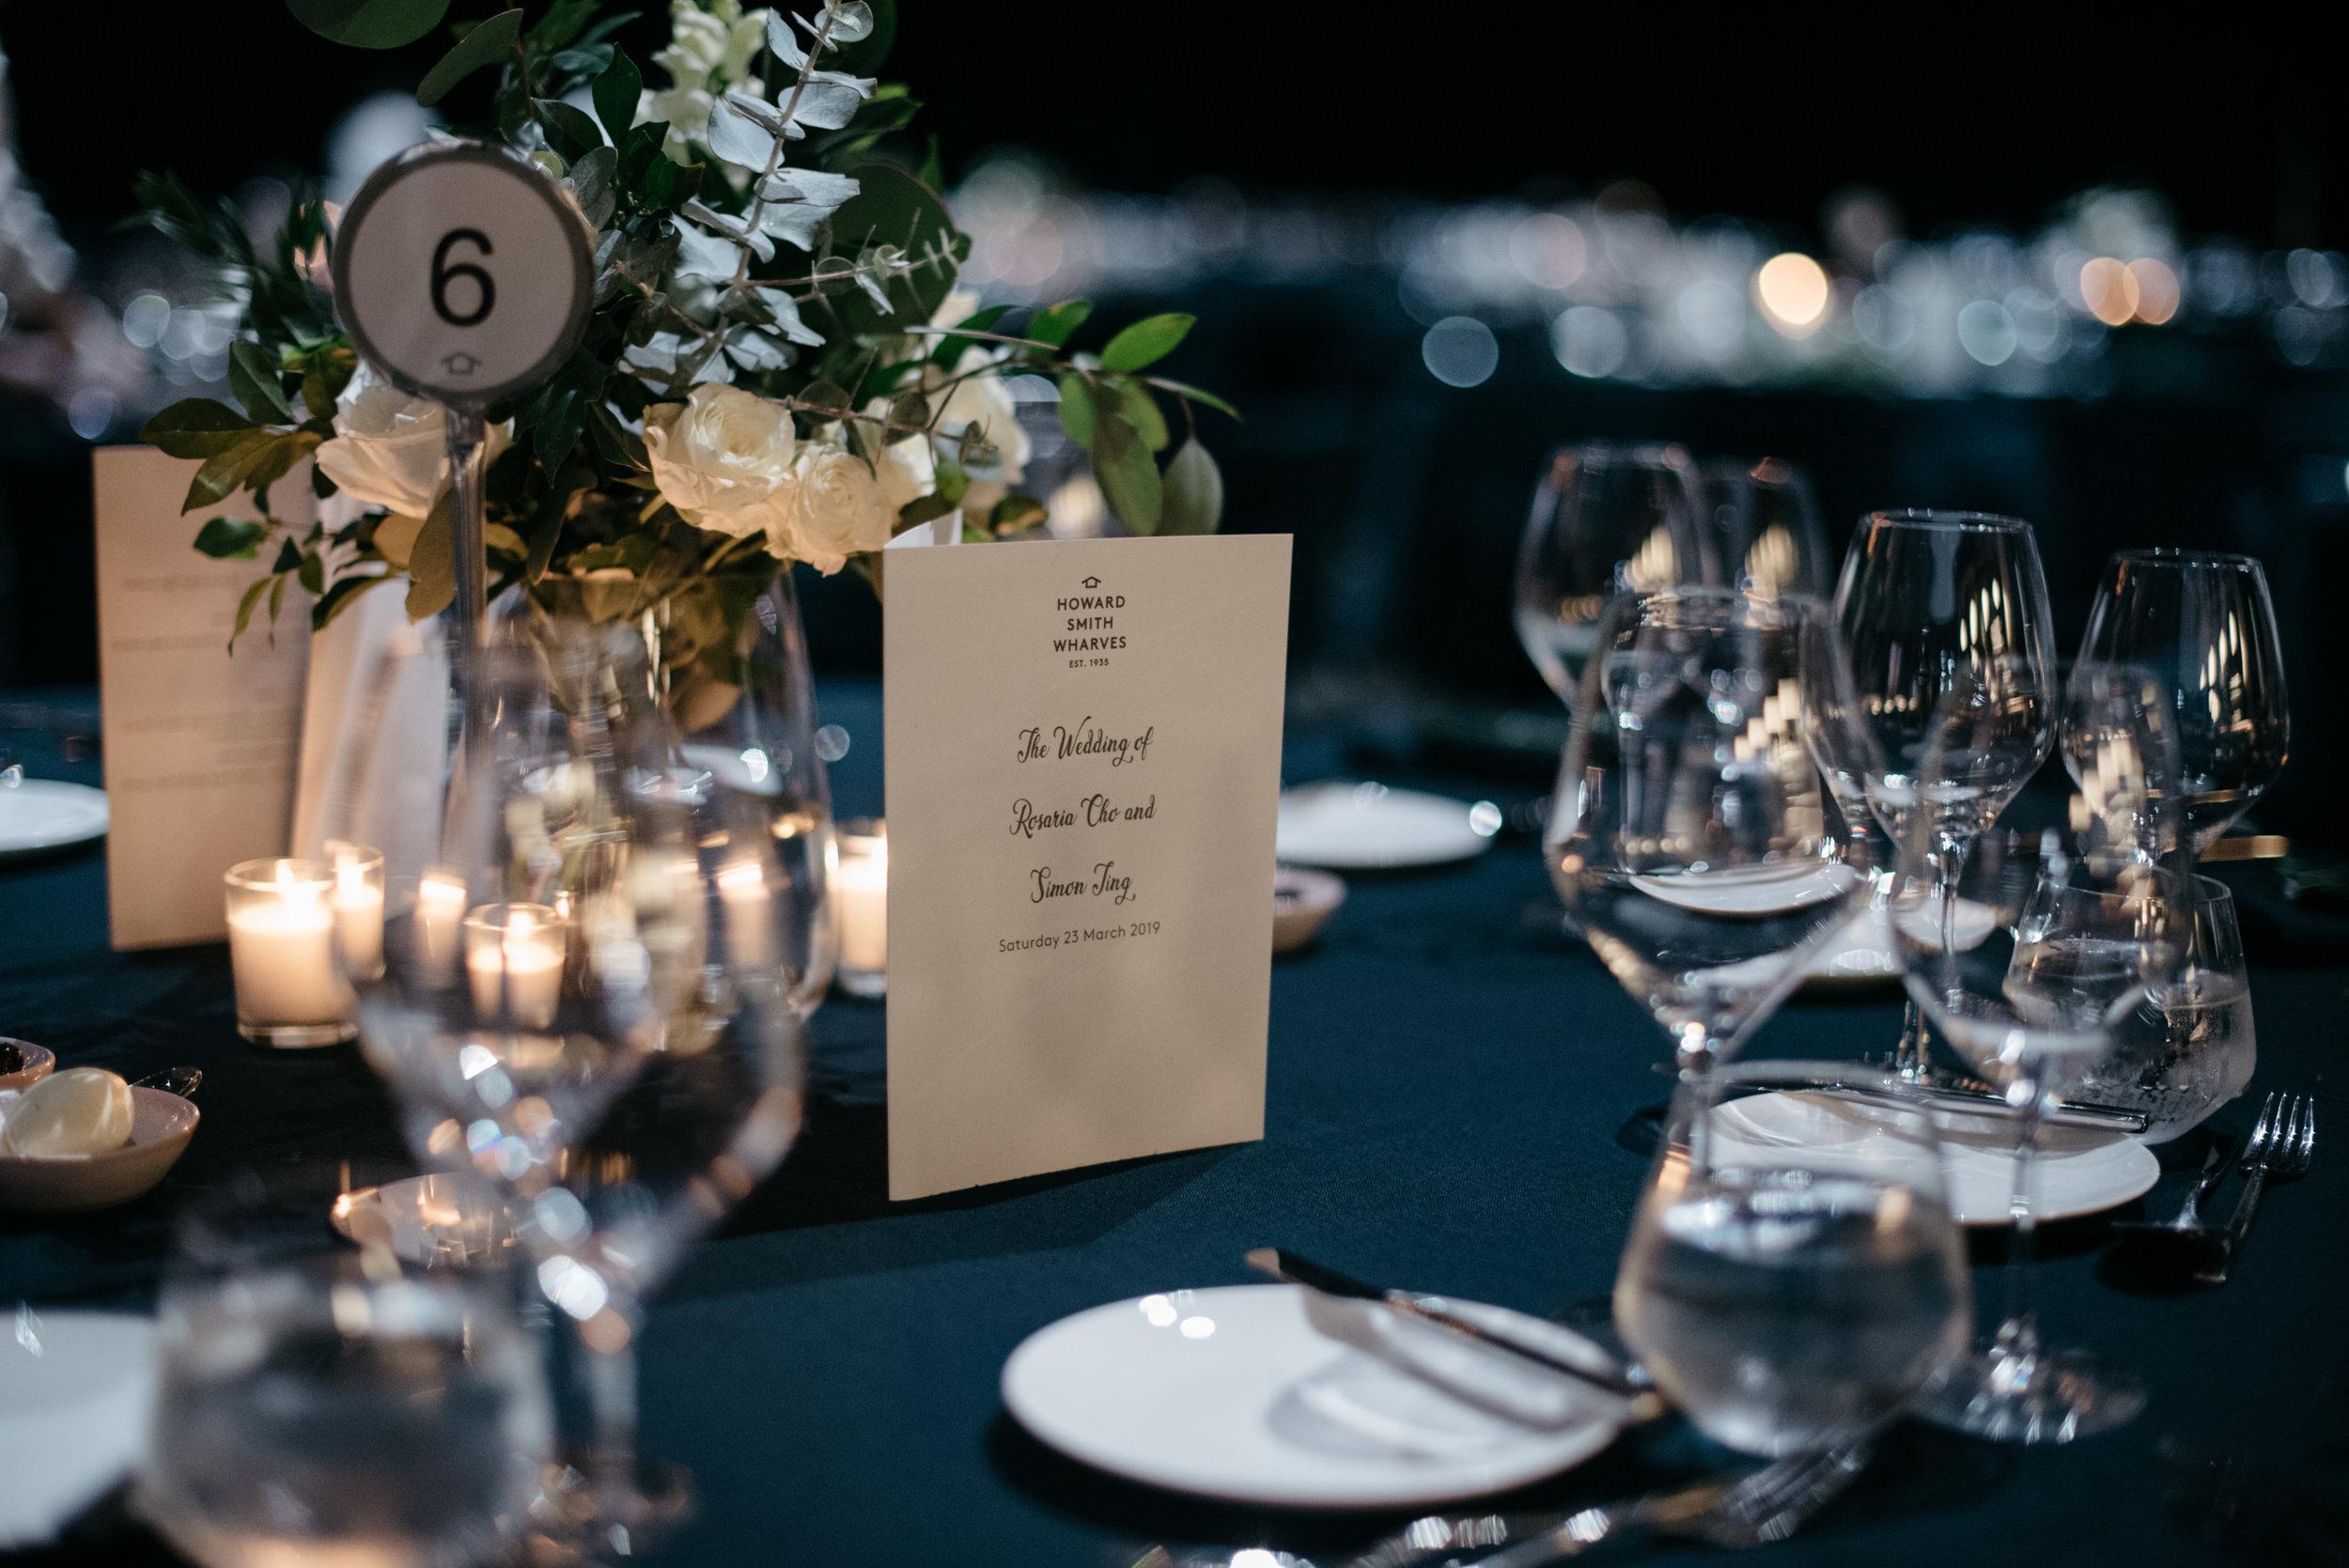 Howard Smith Wharves wedding reception, Brisbane Wedding, Ephemeral Creative